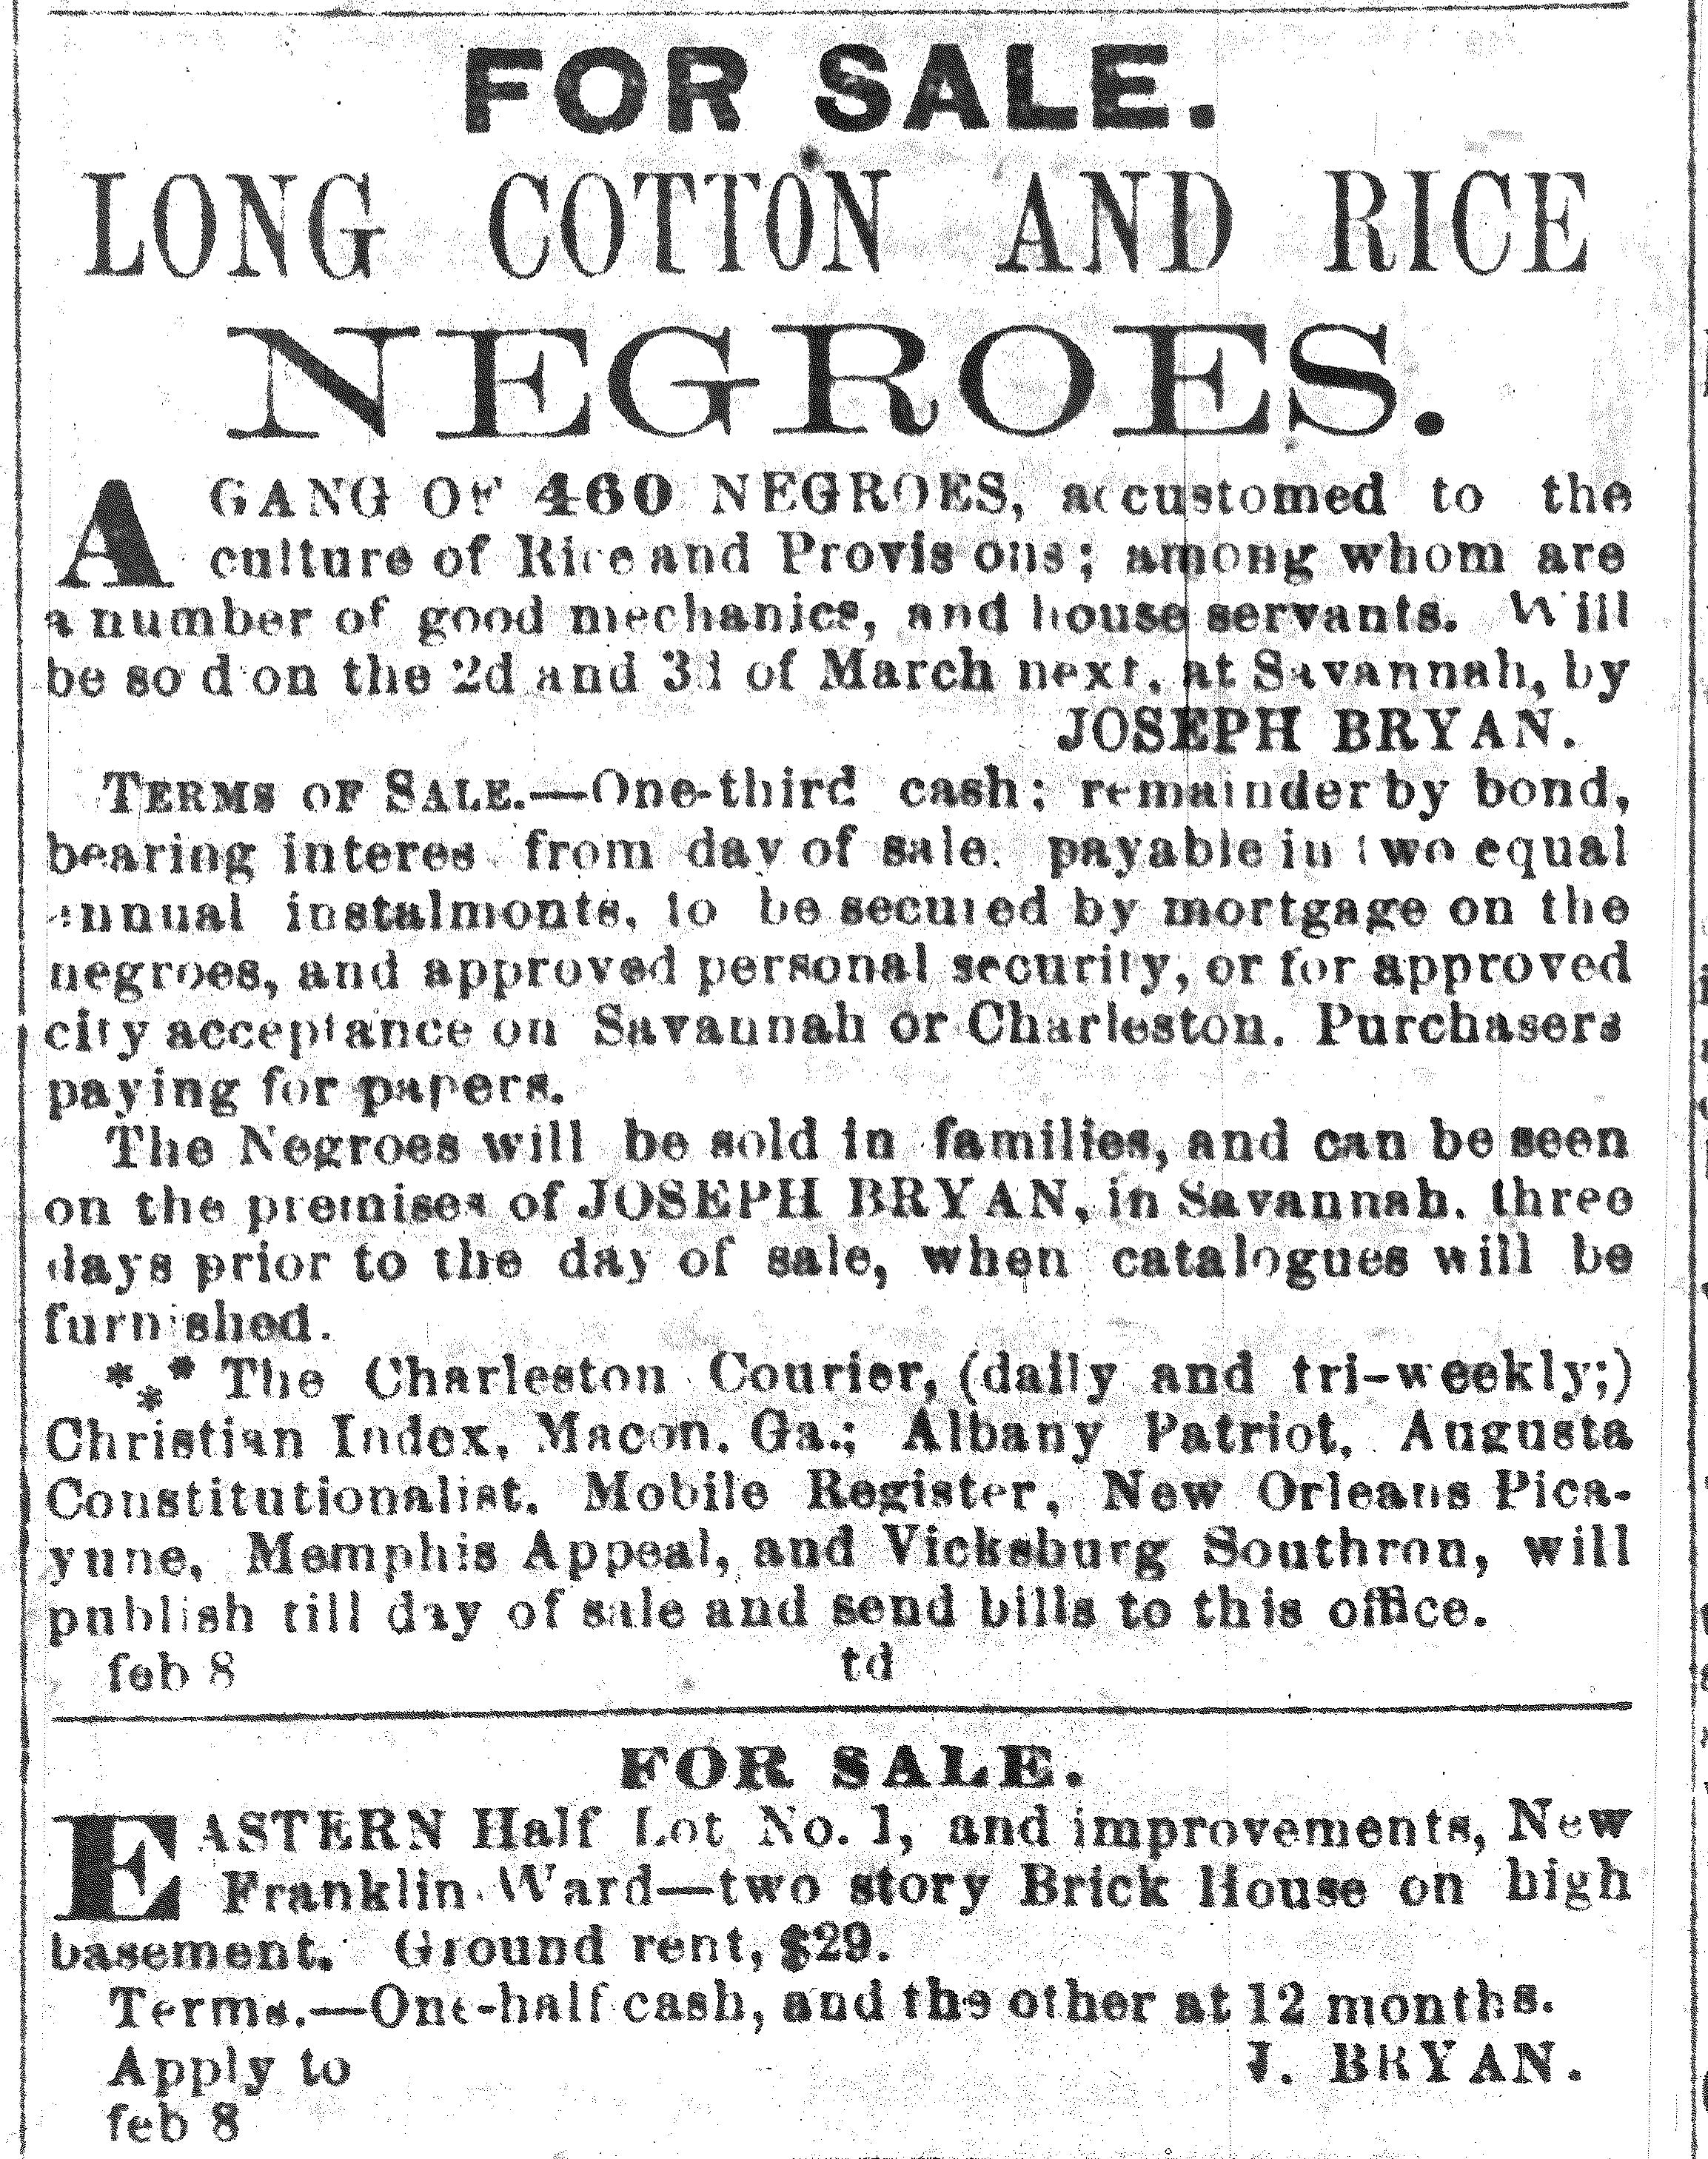 Butler slave sale ad for Tuesday, February 8, 1859, by slave broker Joseph Bryan, Savannah Republican newspaper, page 2, Column D.